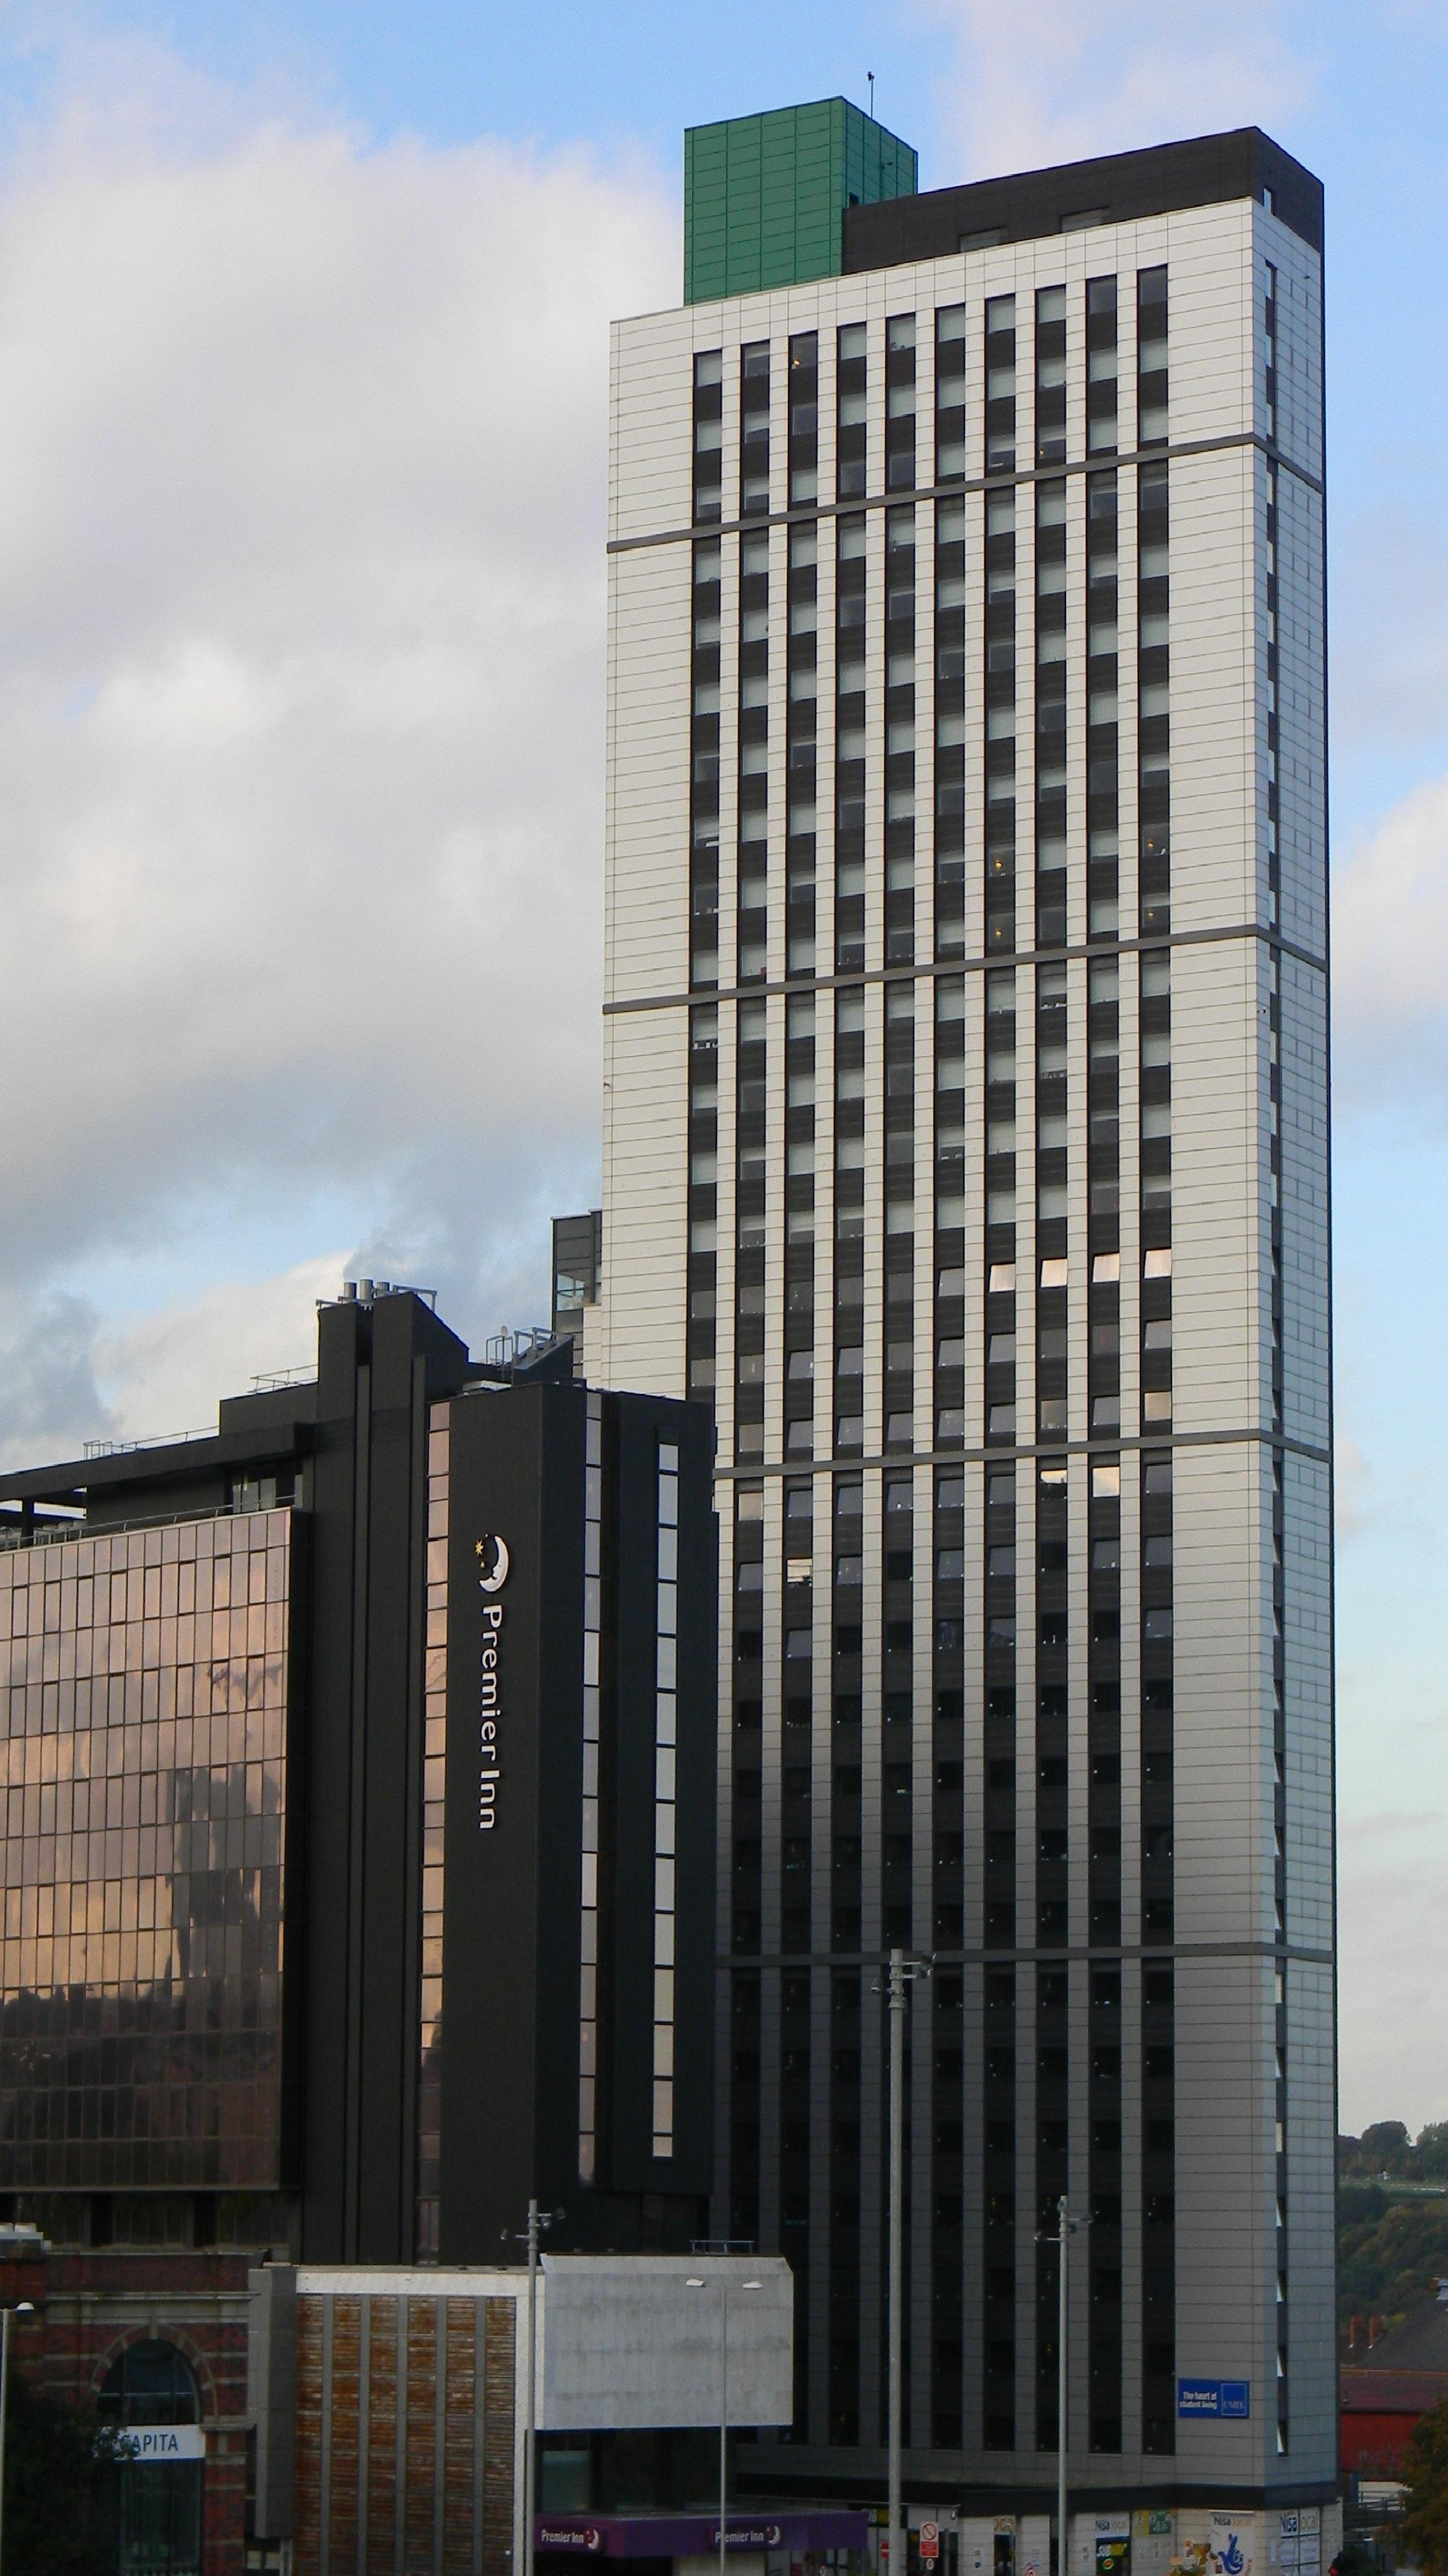 Briatol List Buildings